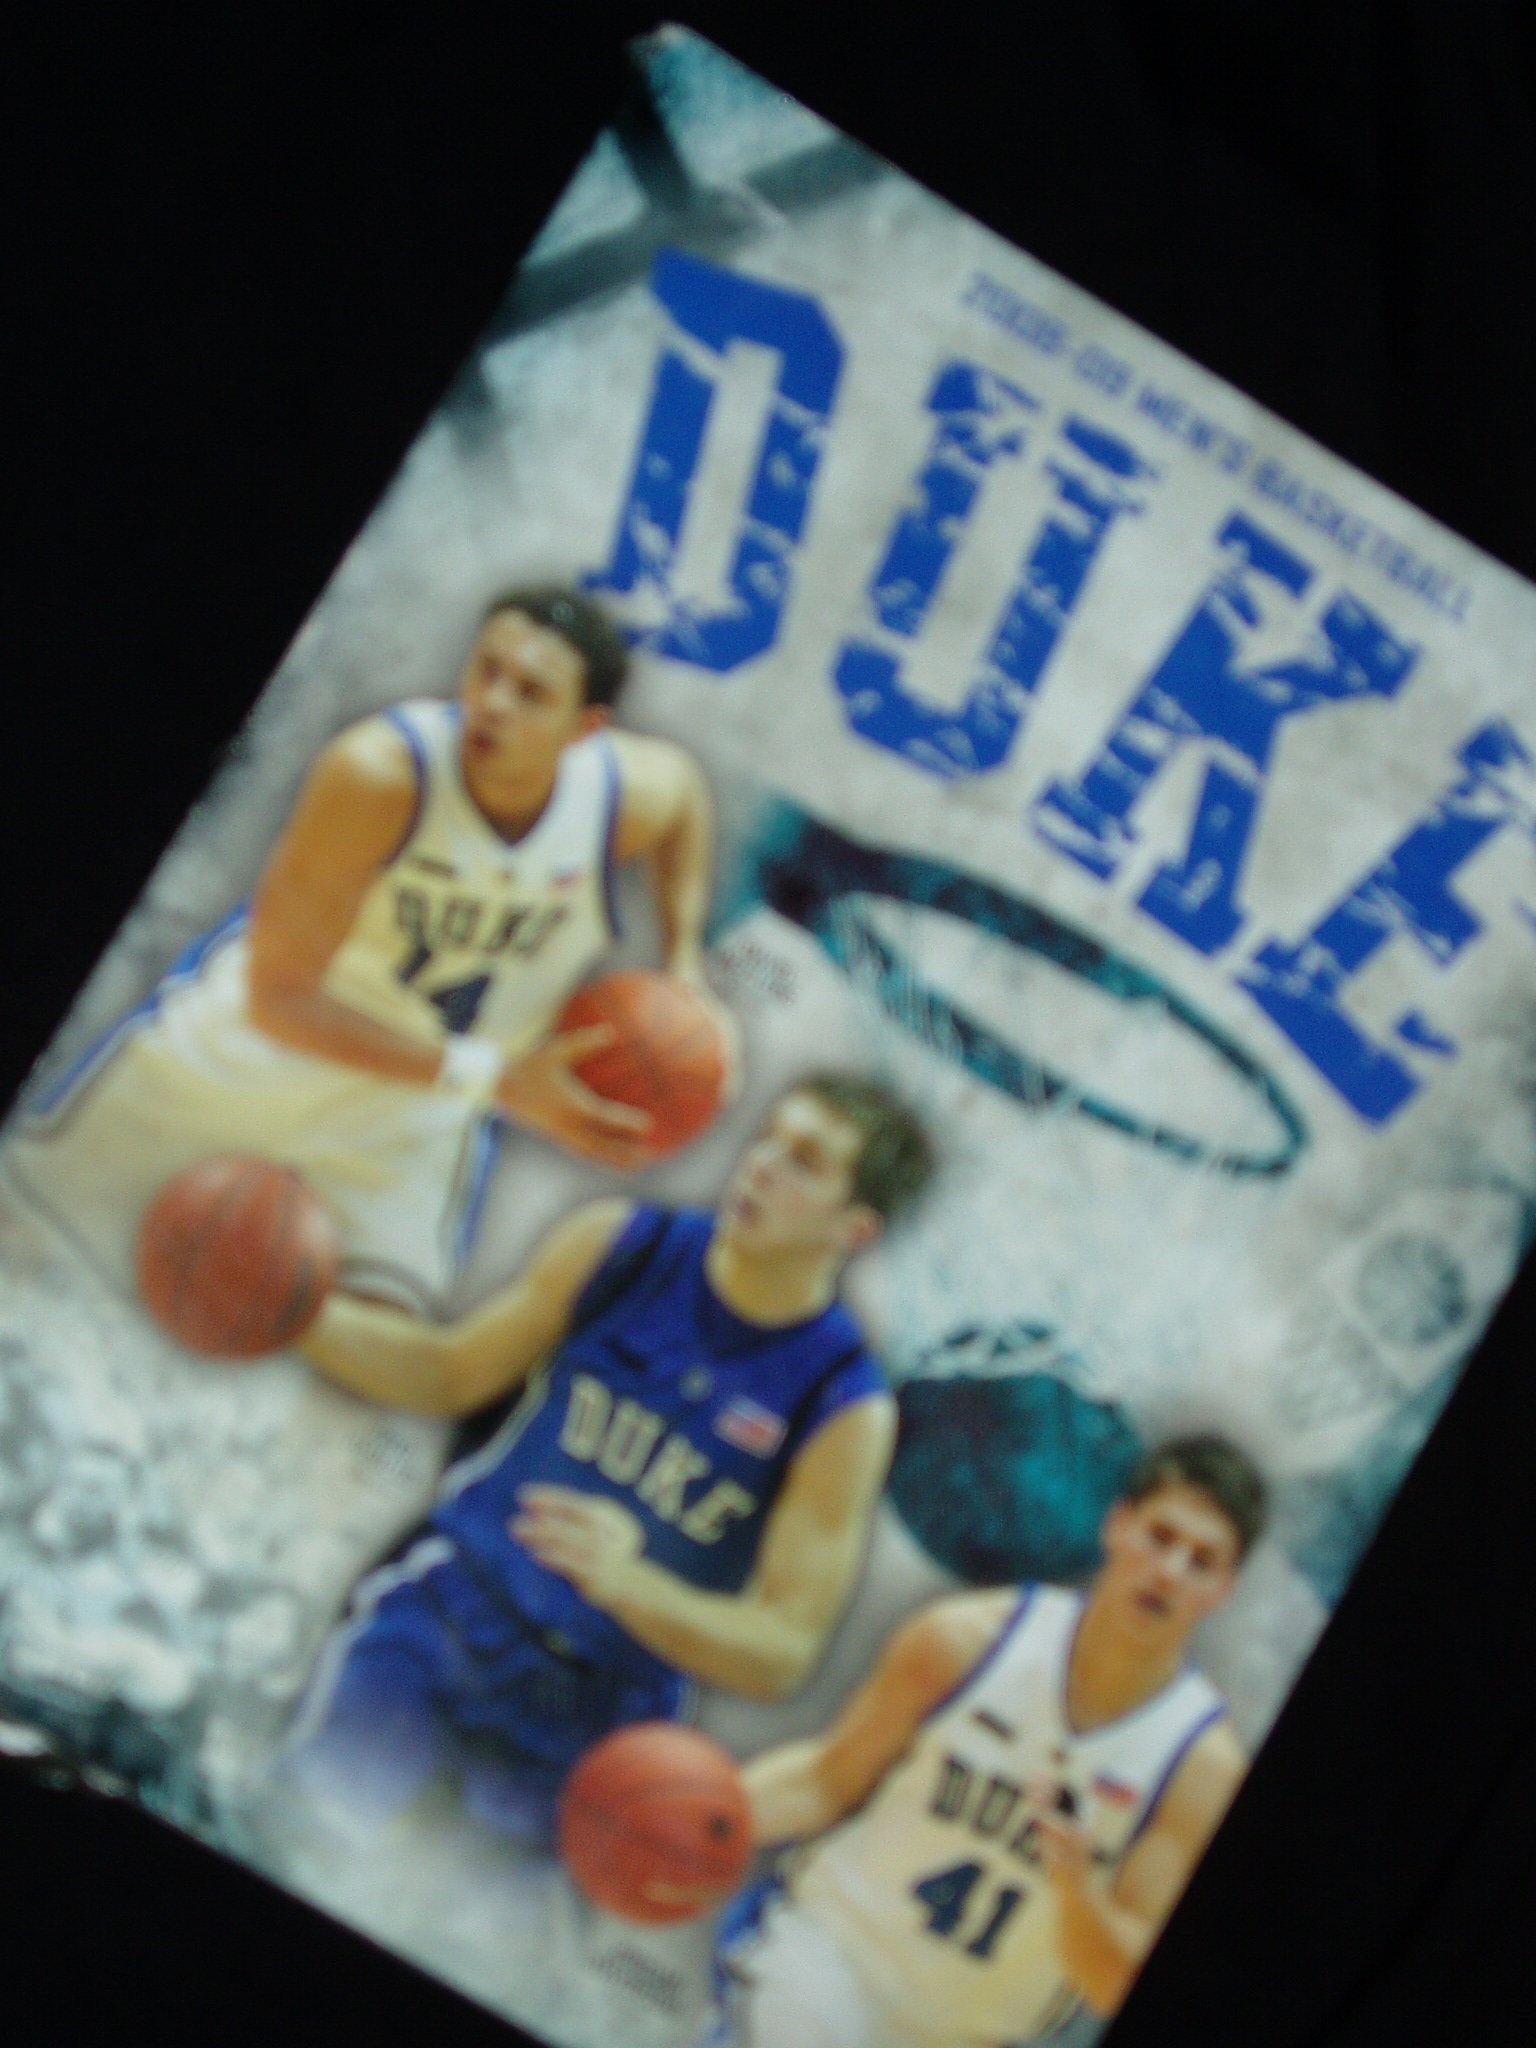 Download 2008-09 Duke Men's Basketball Yearbook PDF